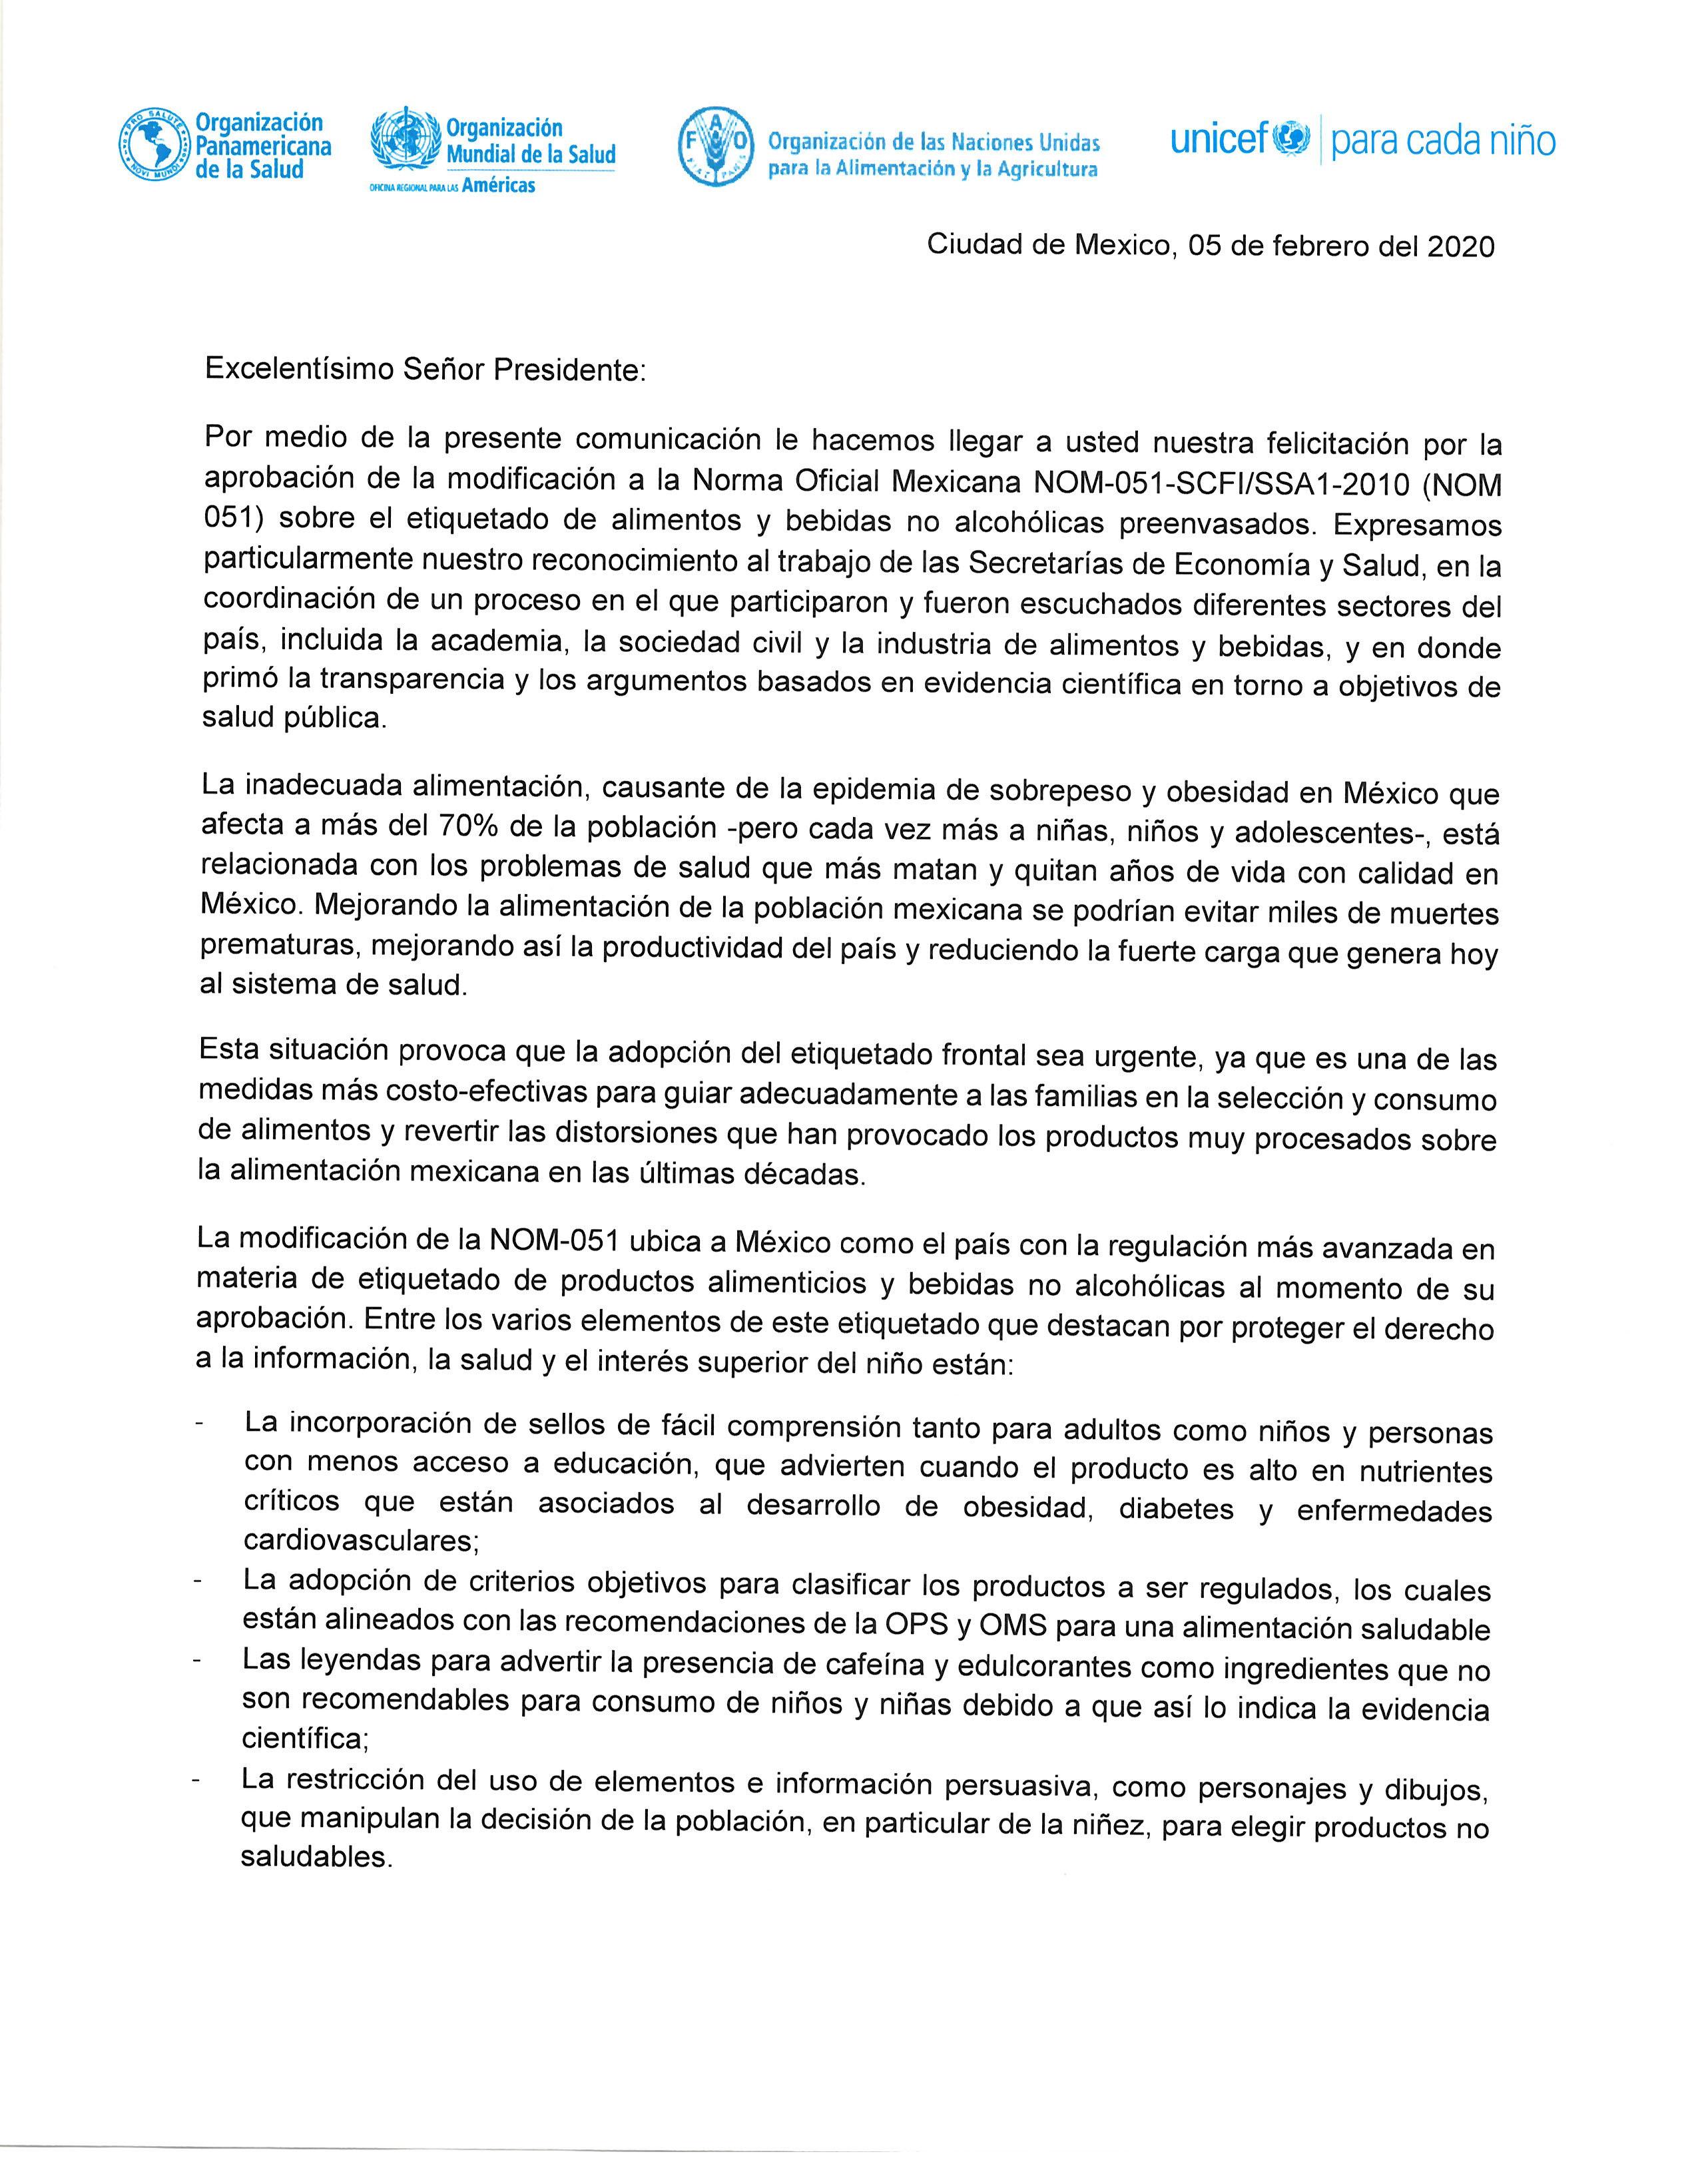 /cms/uploads/image/file/562171/Carta_presidencia-1.jpg